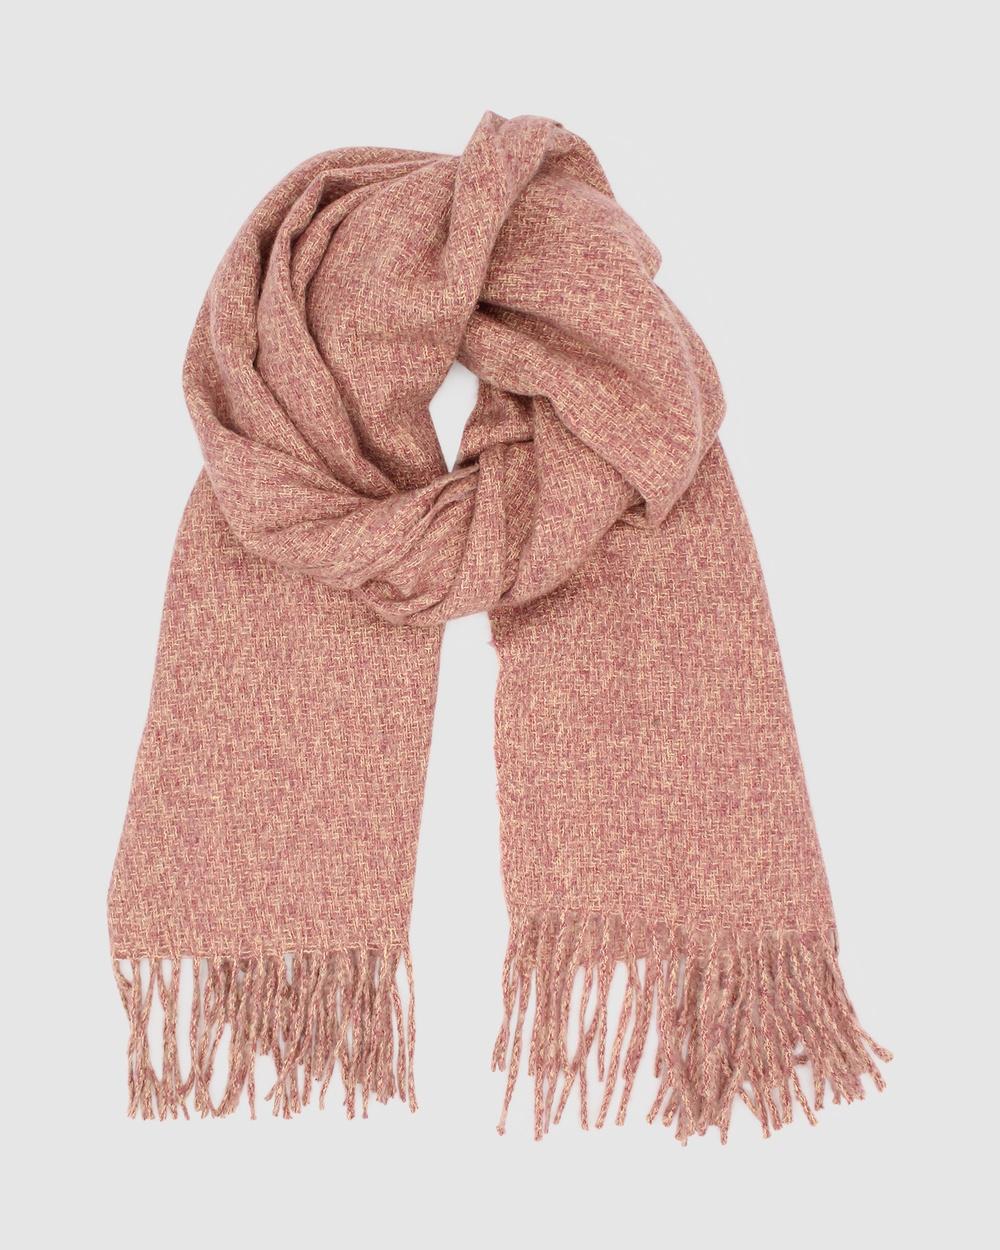 Morgan & Taylor Teresa Scarf Scarves Gloves Pink